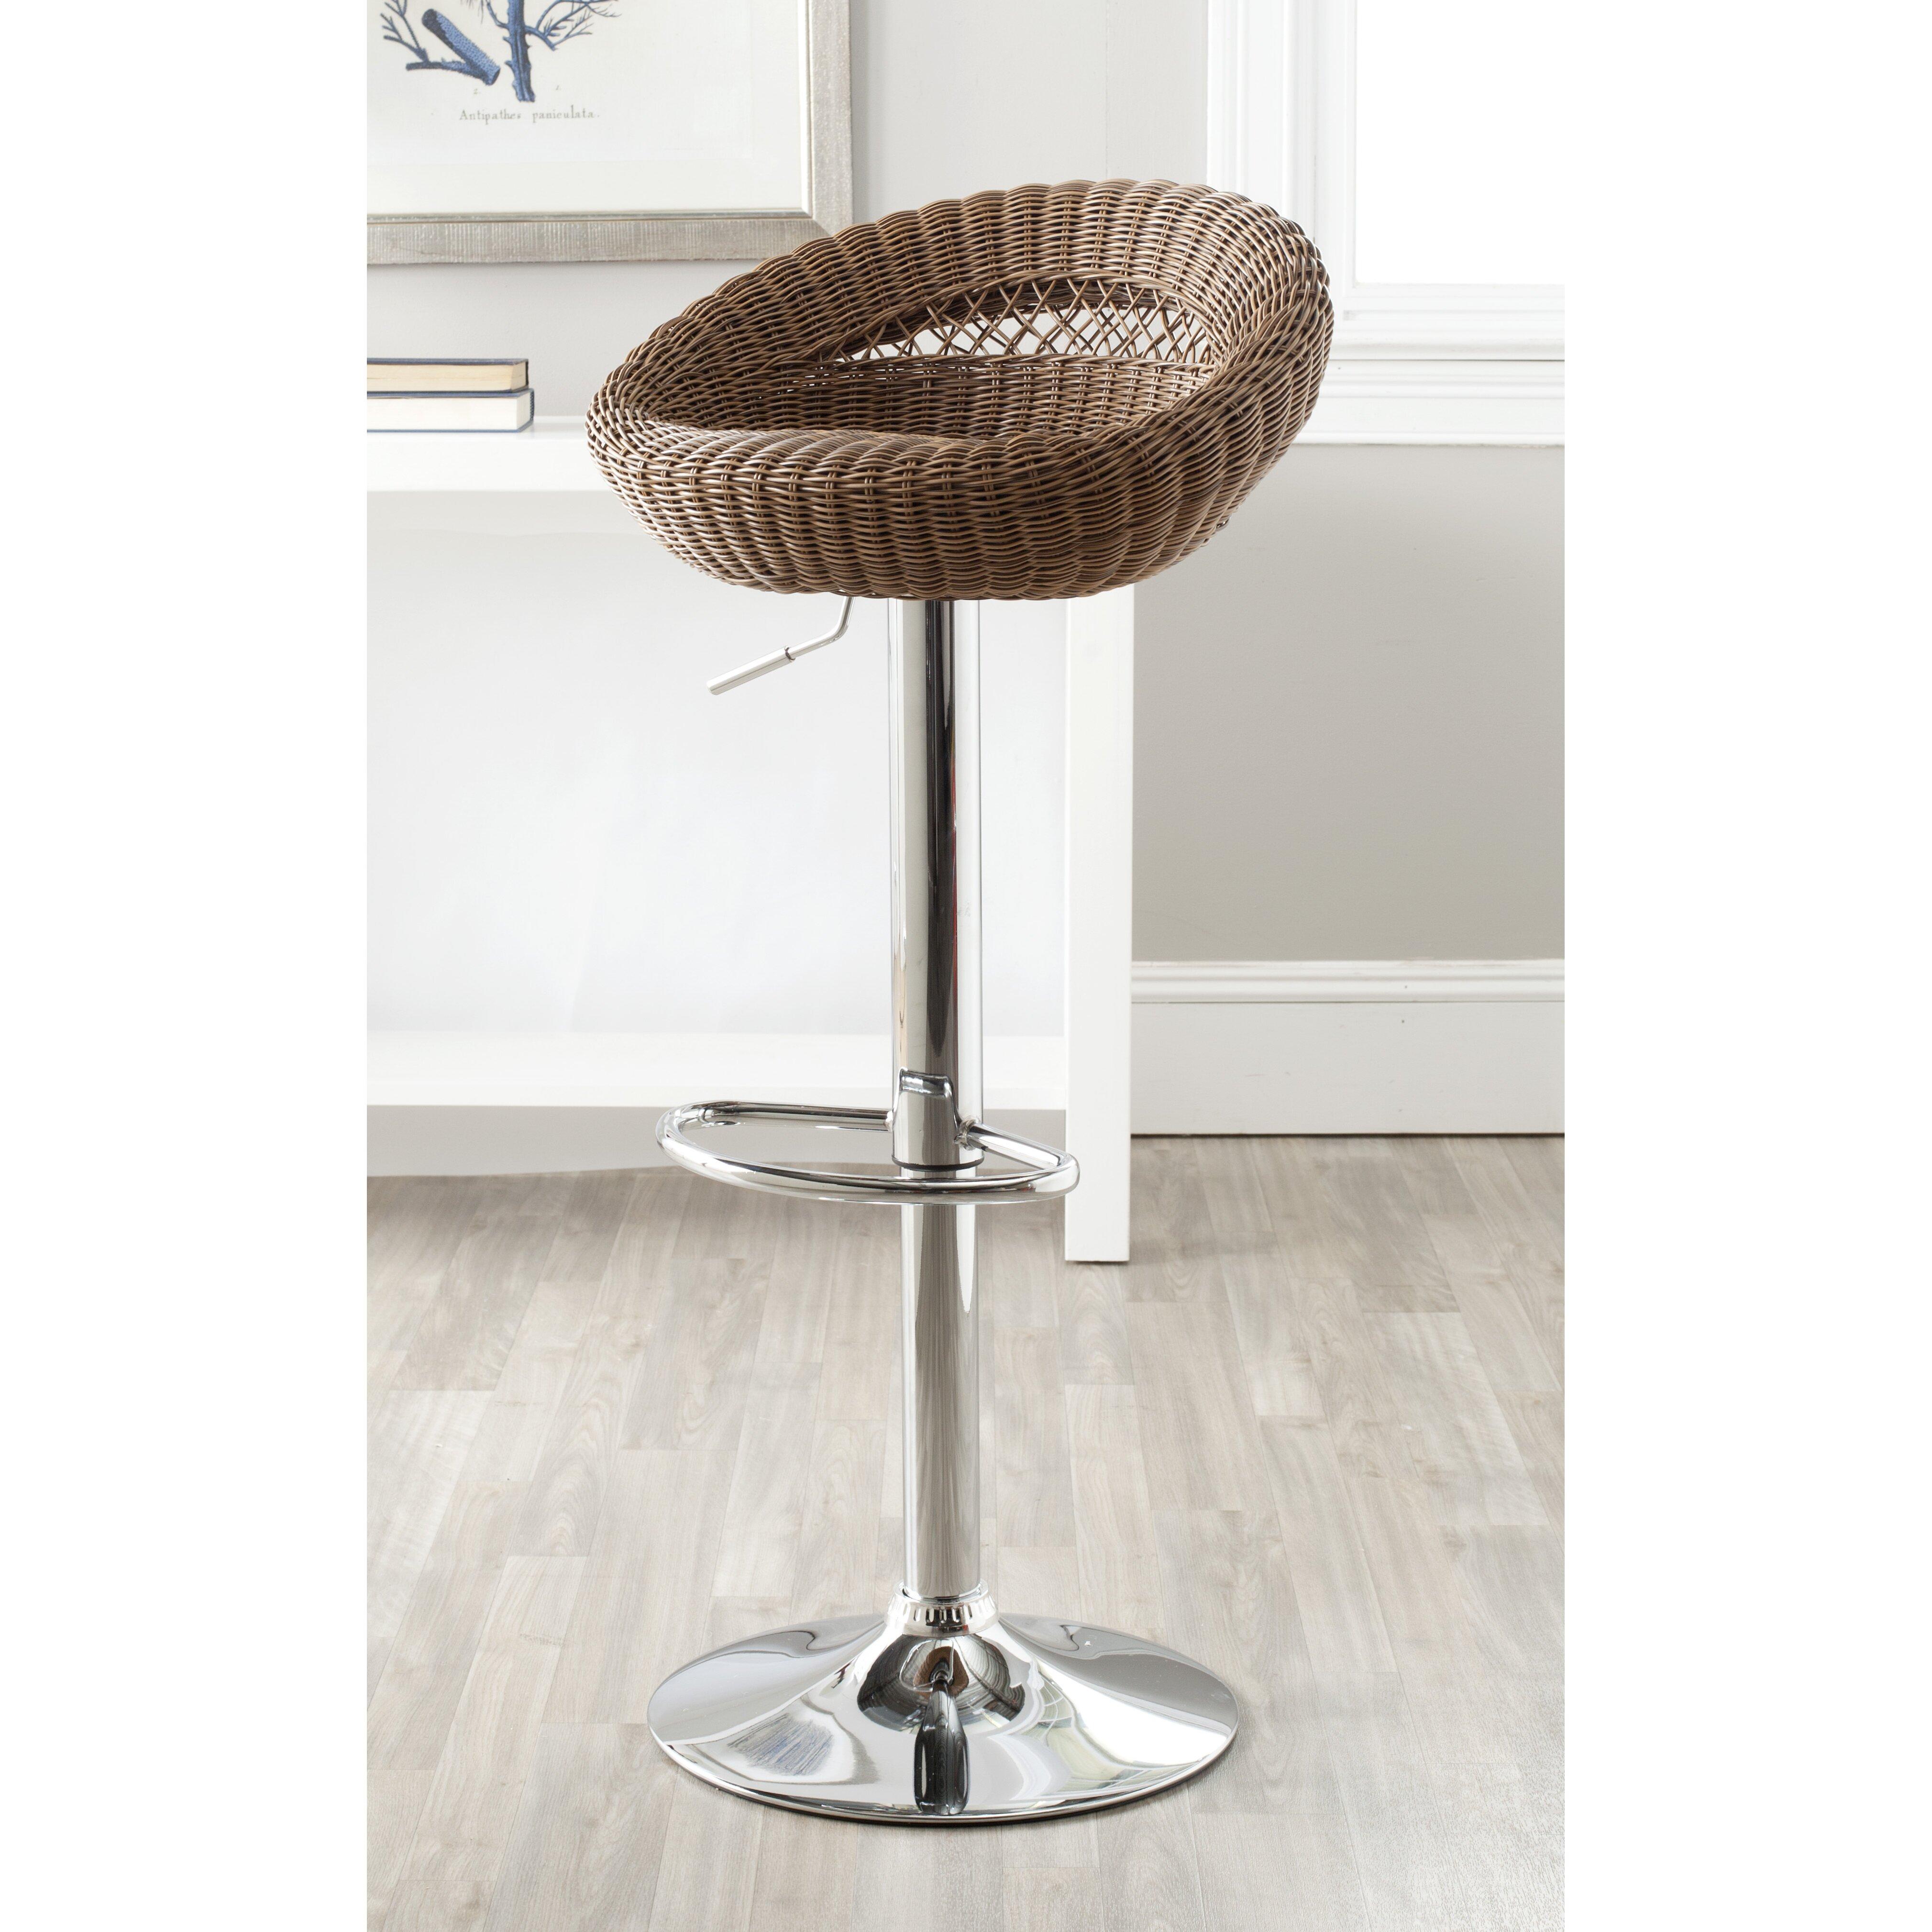 safavieh adjustable height swivel bar stool reviews. Black Bedroom Furniture Sets. Home Design Ideas